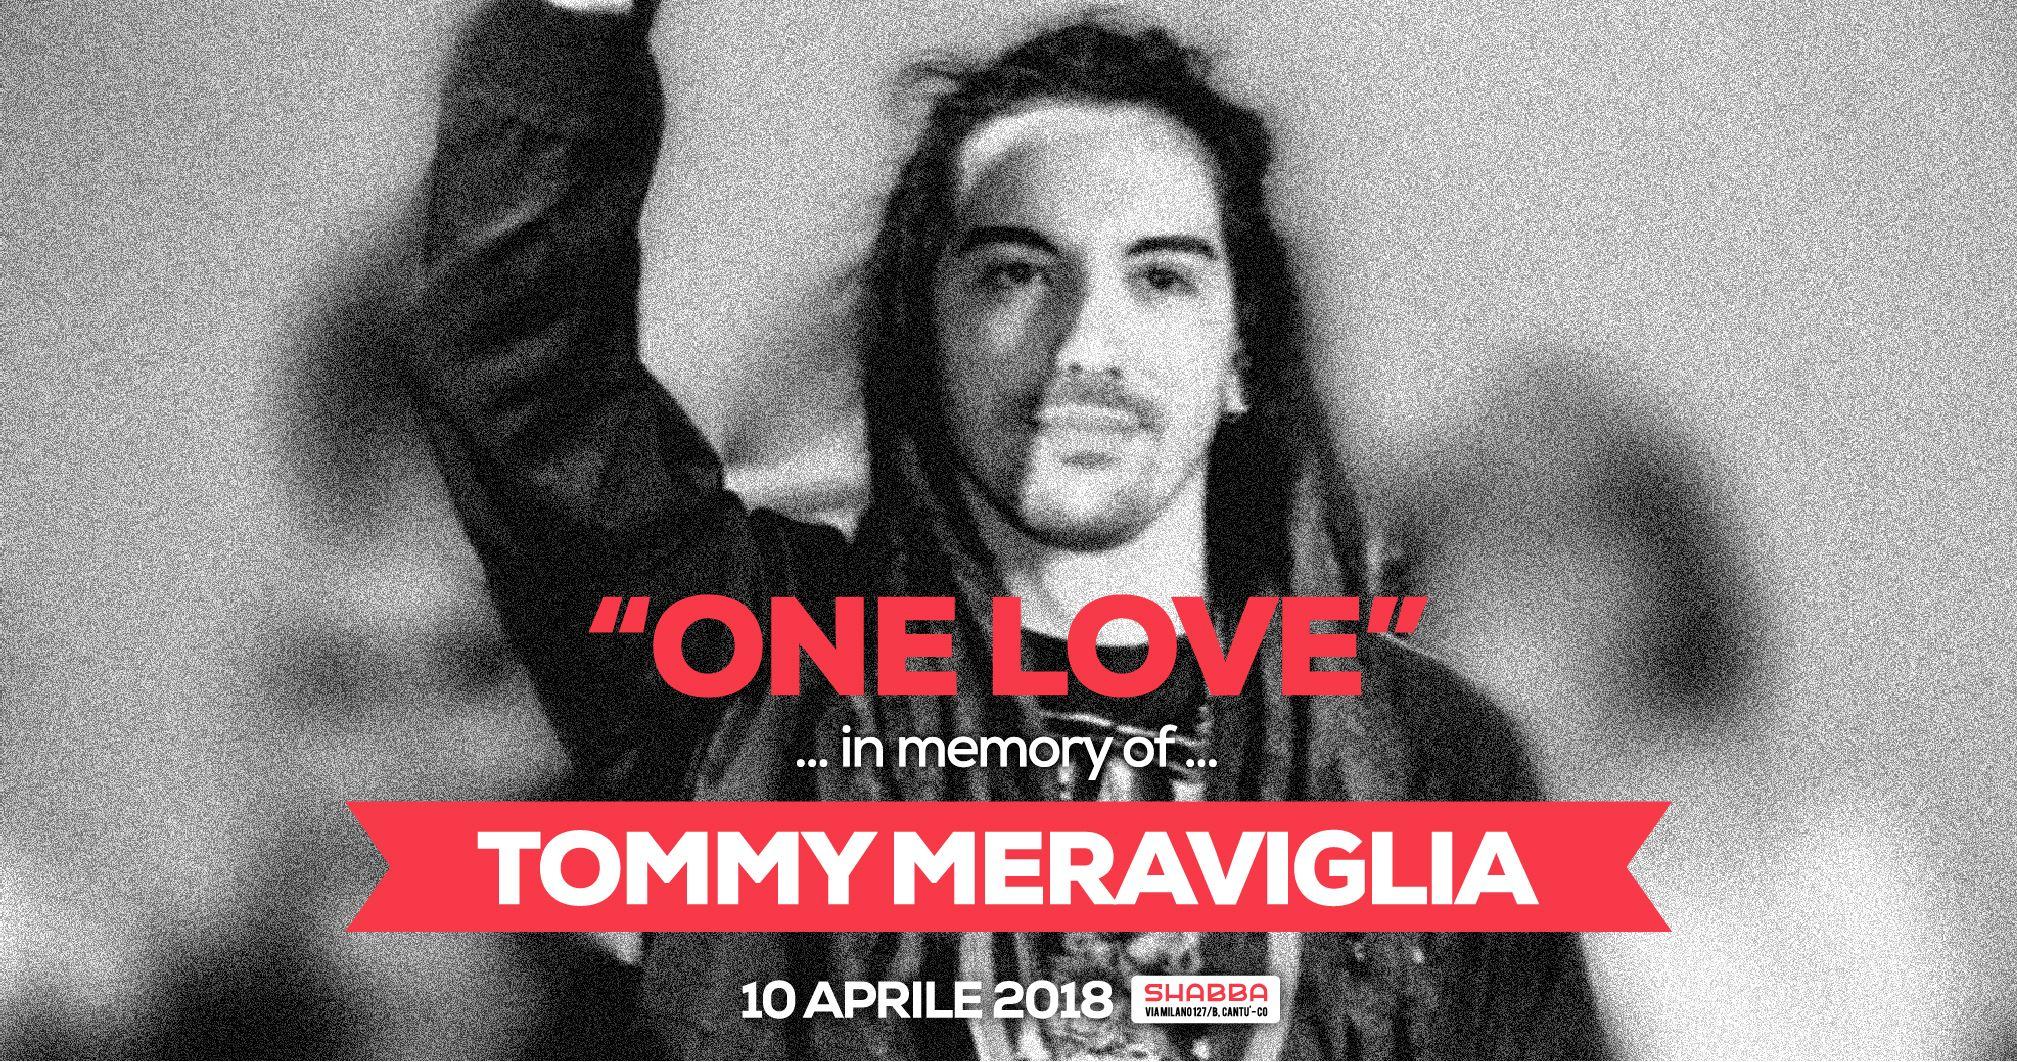 One love night: in loving memory of Tommy Meraviglia